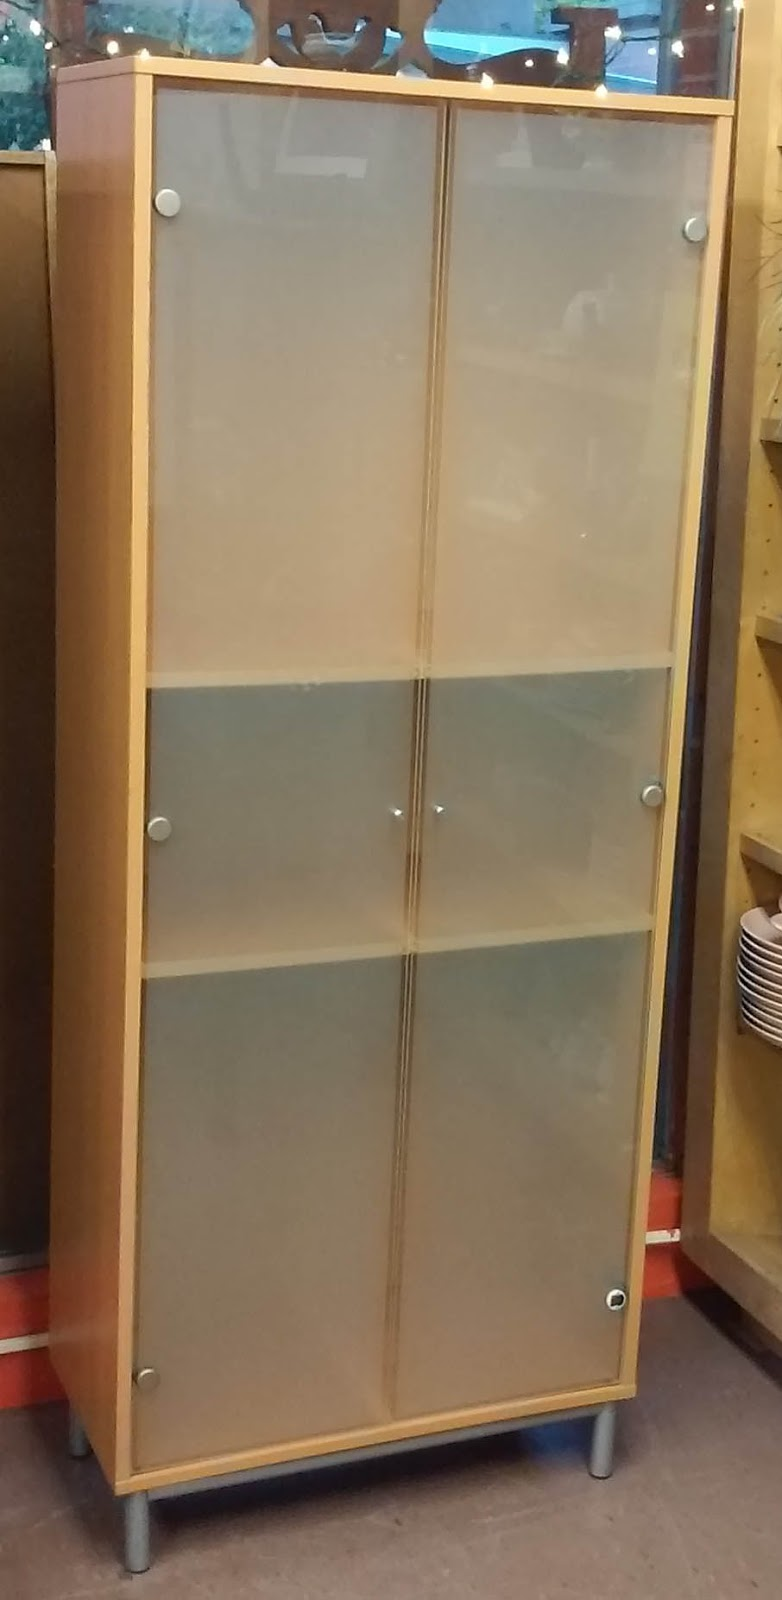 Uhuru Furniture Amp Collectibles Sold Reduced Ikea 6